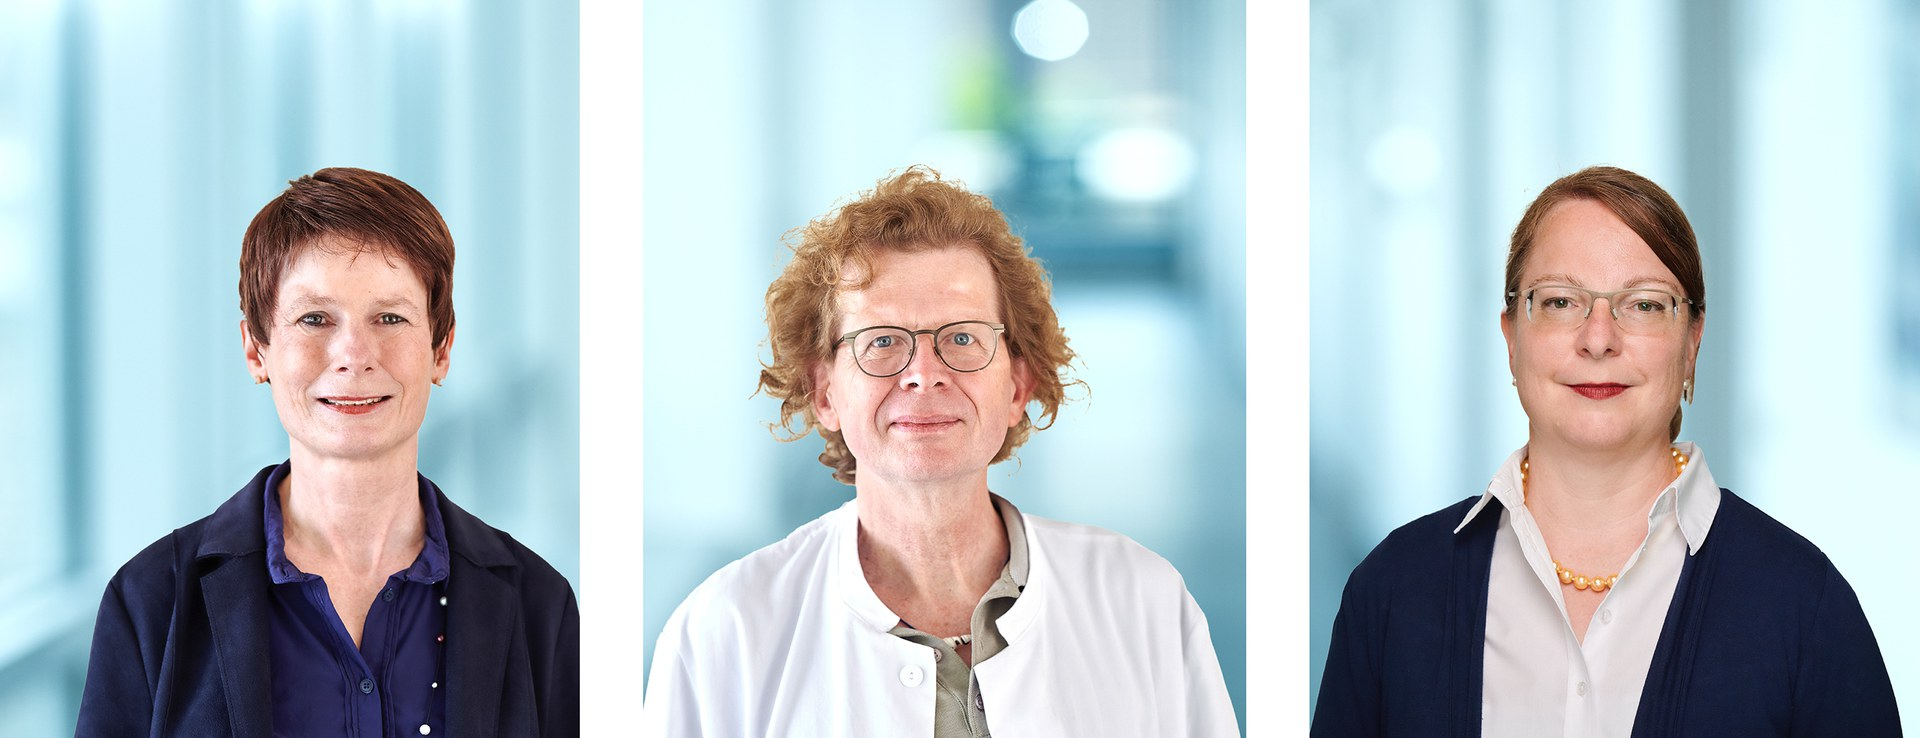 Patientenkolloquium des Universitätsklinikums Bonn zu Resilienz am 15. Juli: